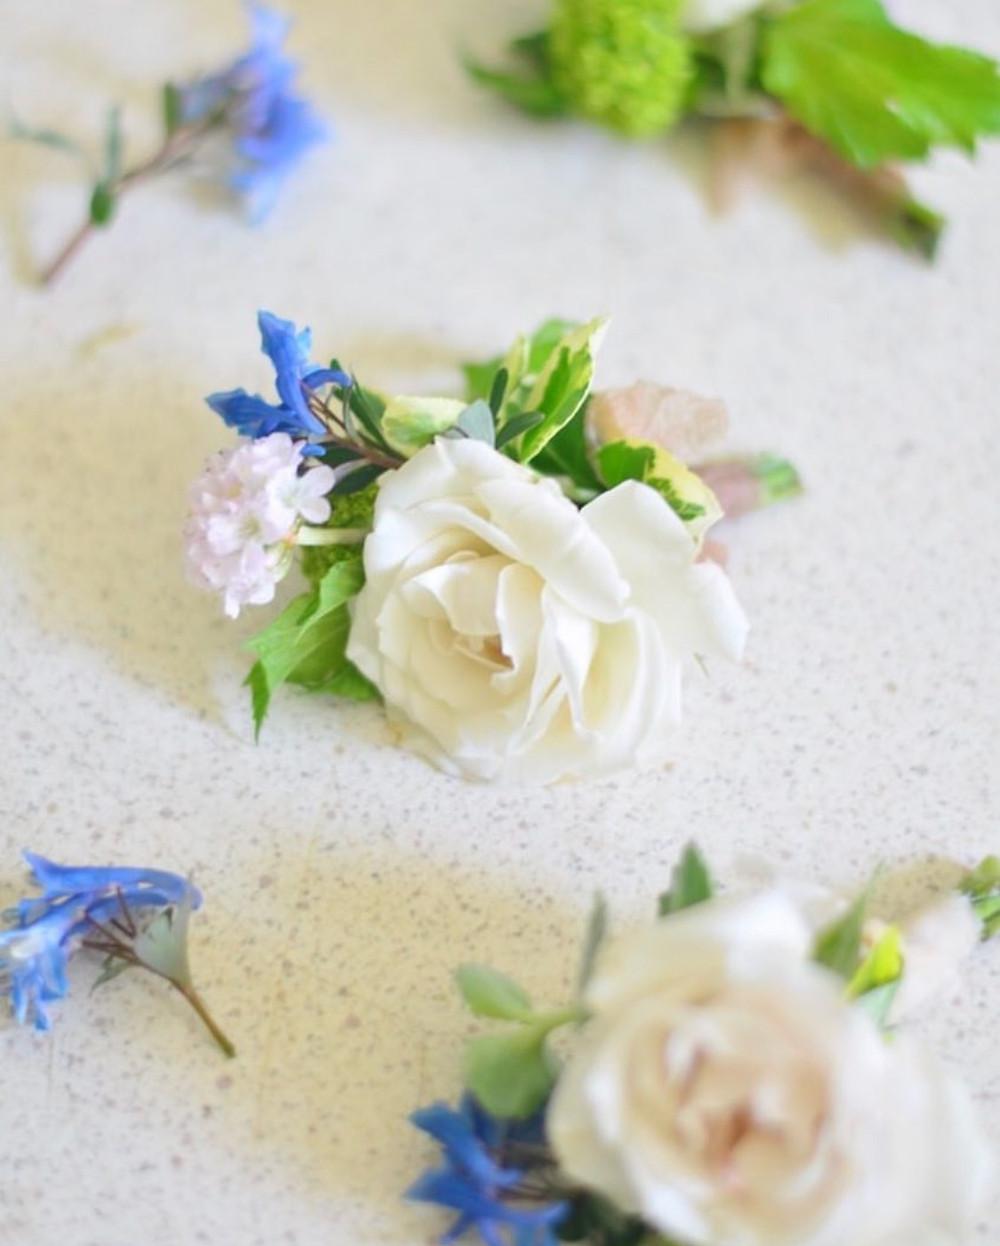 Spray rose boutonnieres